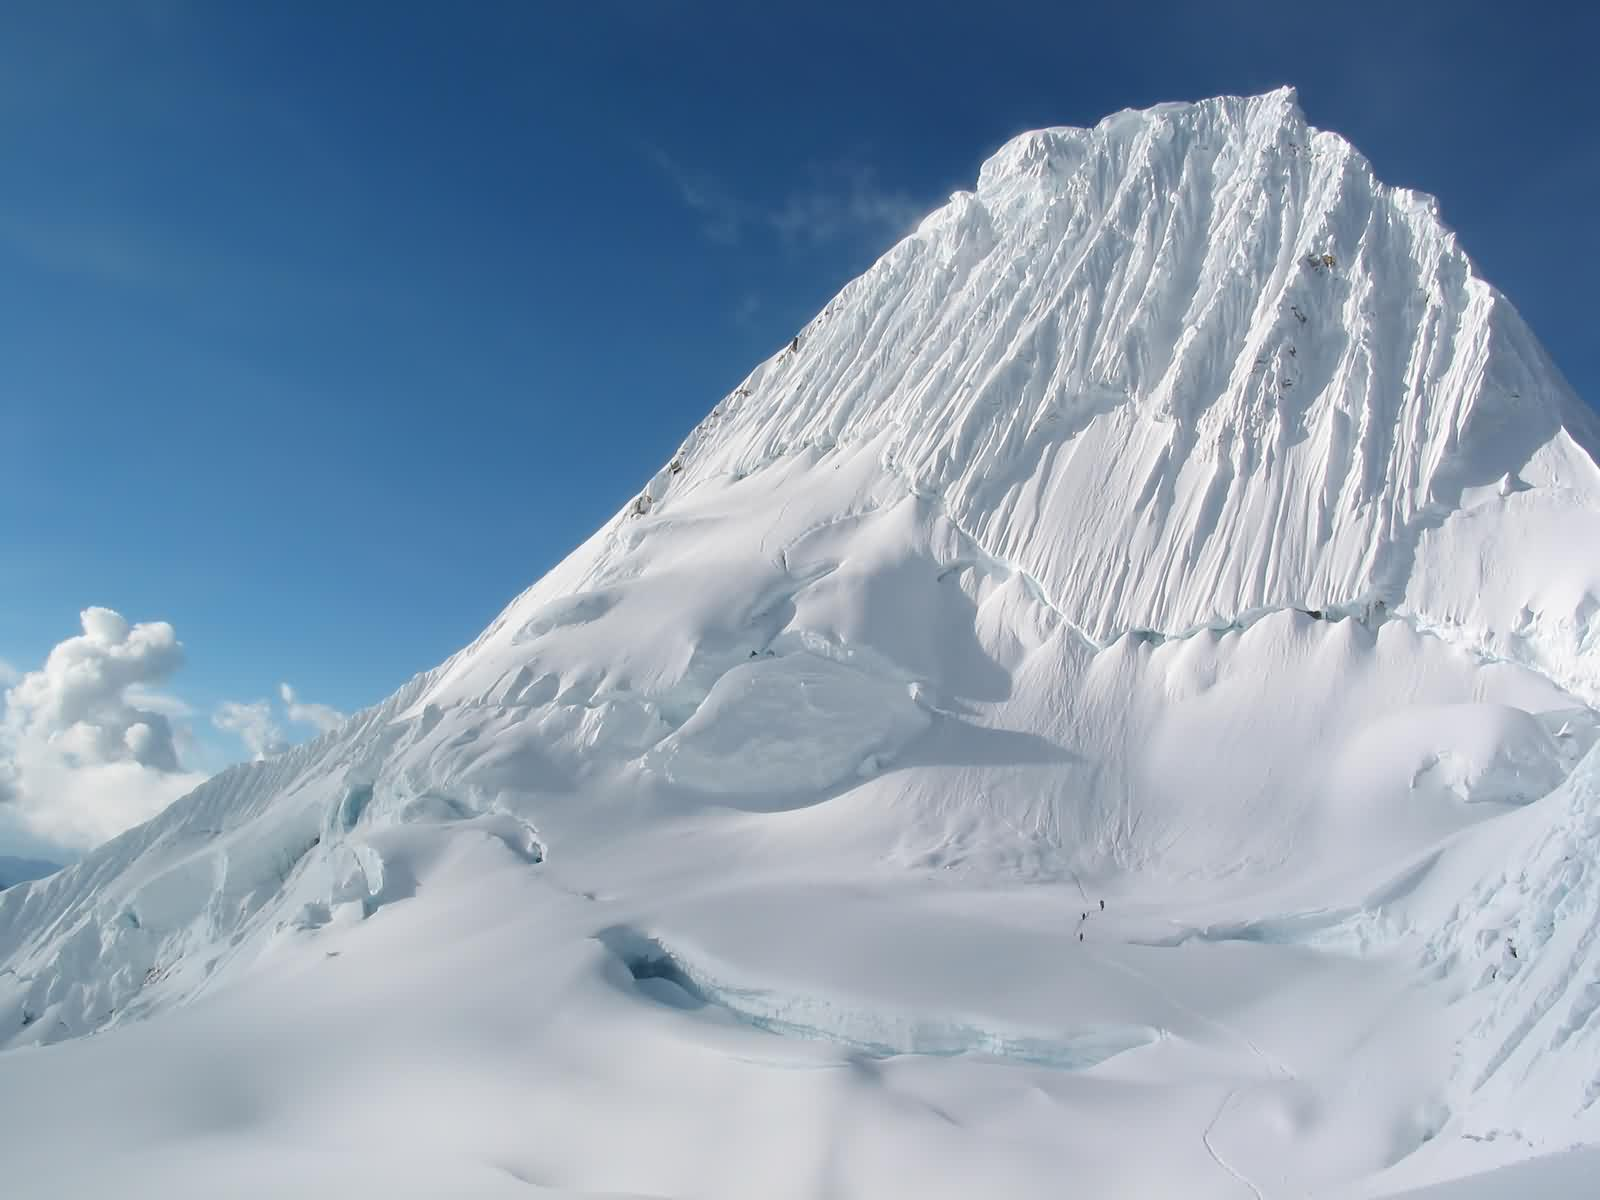 Snow Mountain Wallpaper Desktop - WallpaperSafari